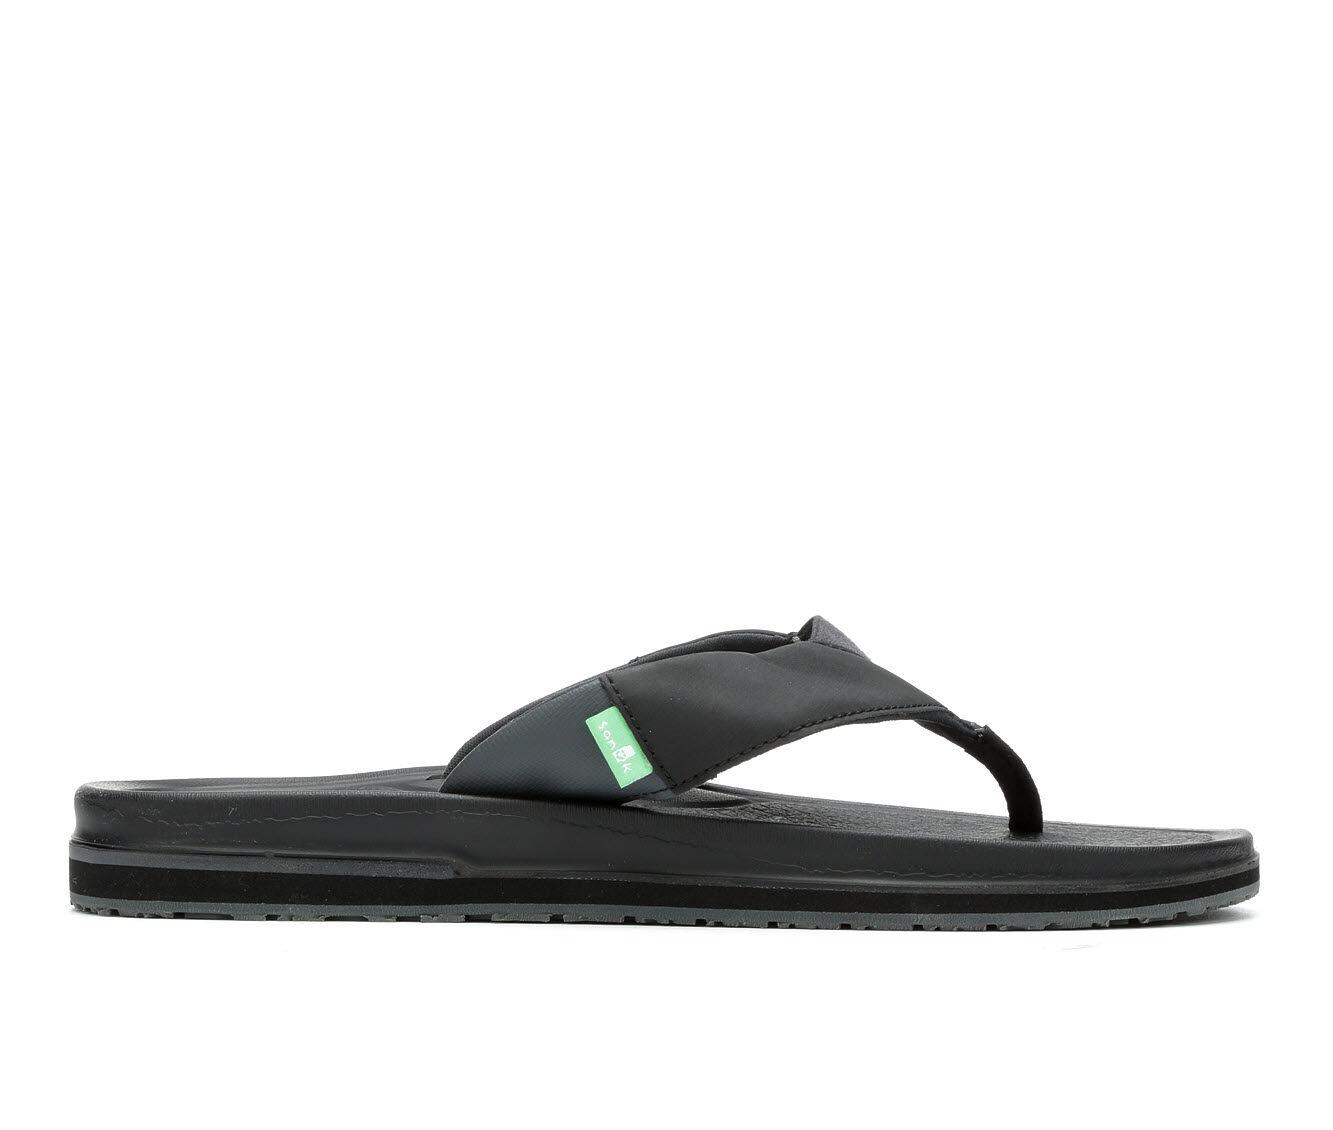 uk shoes_kd1102